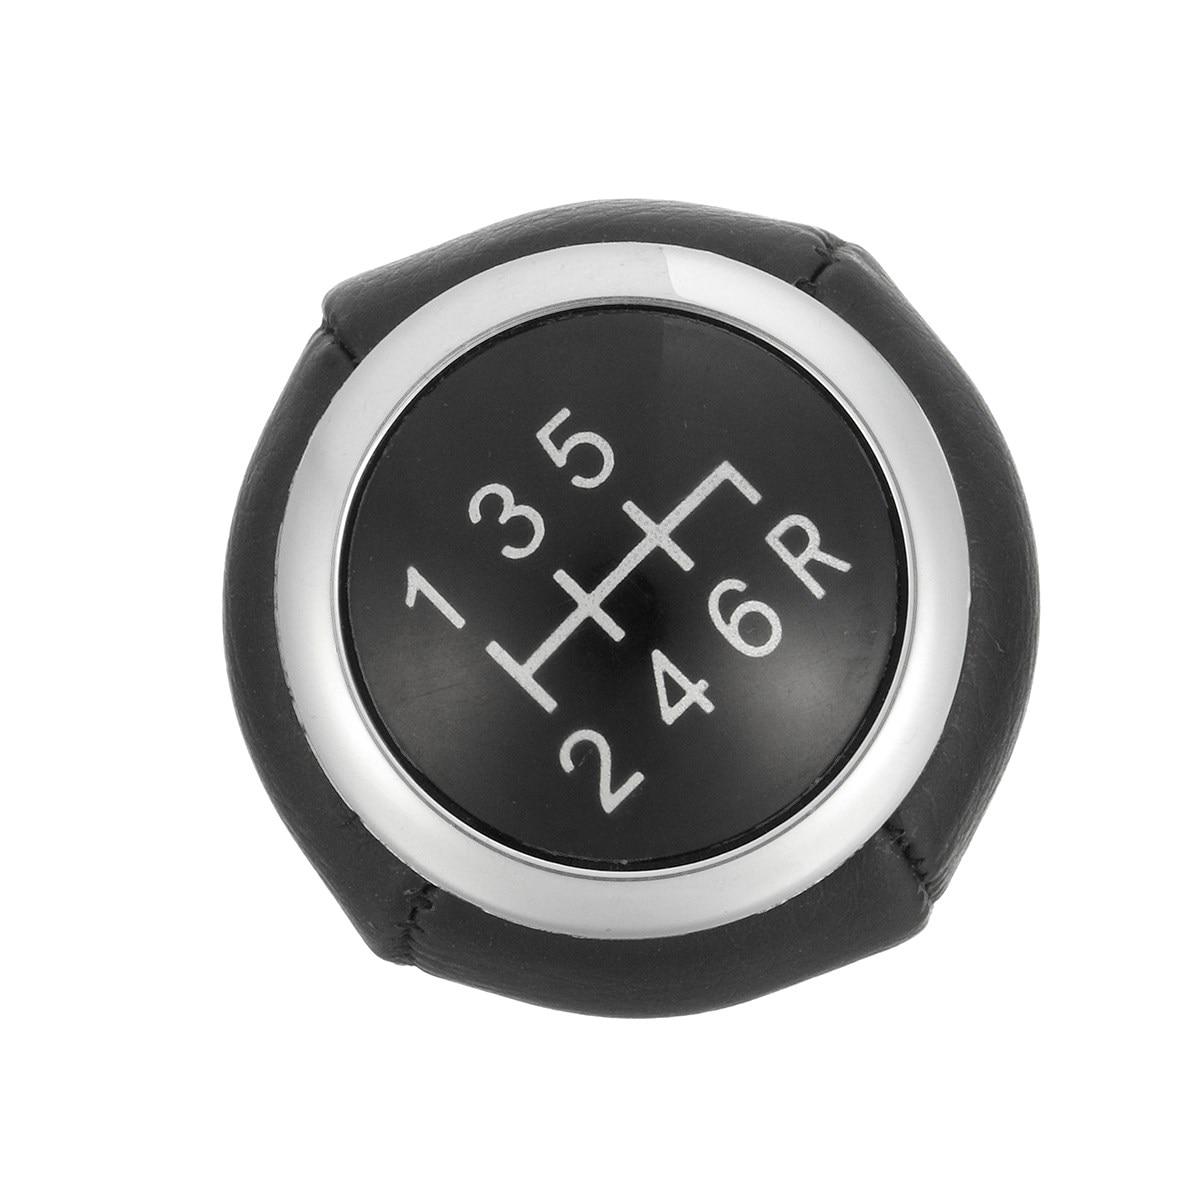 Subaru Legacy: Select lever